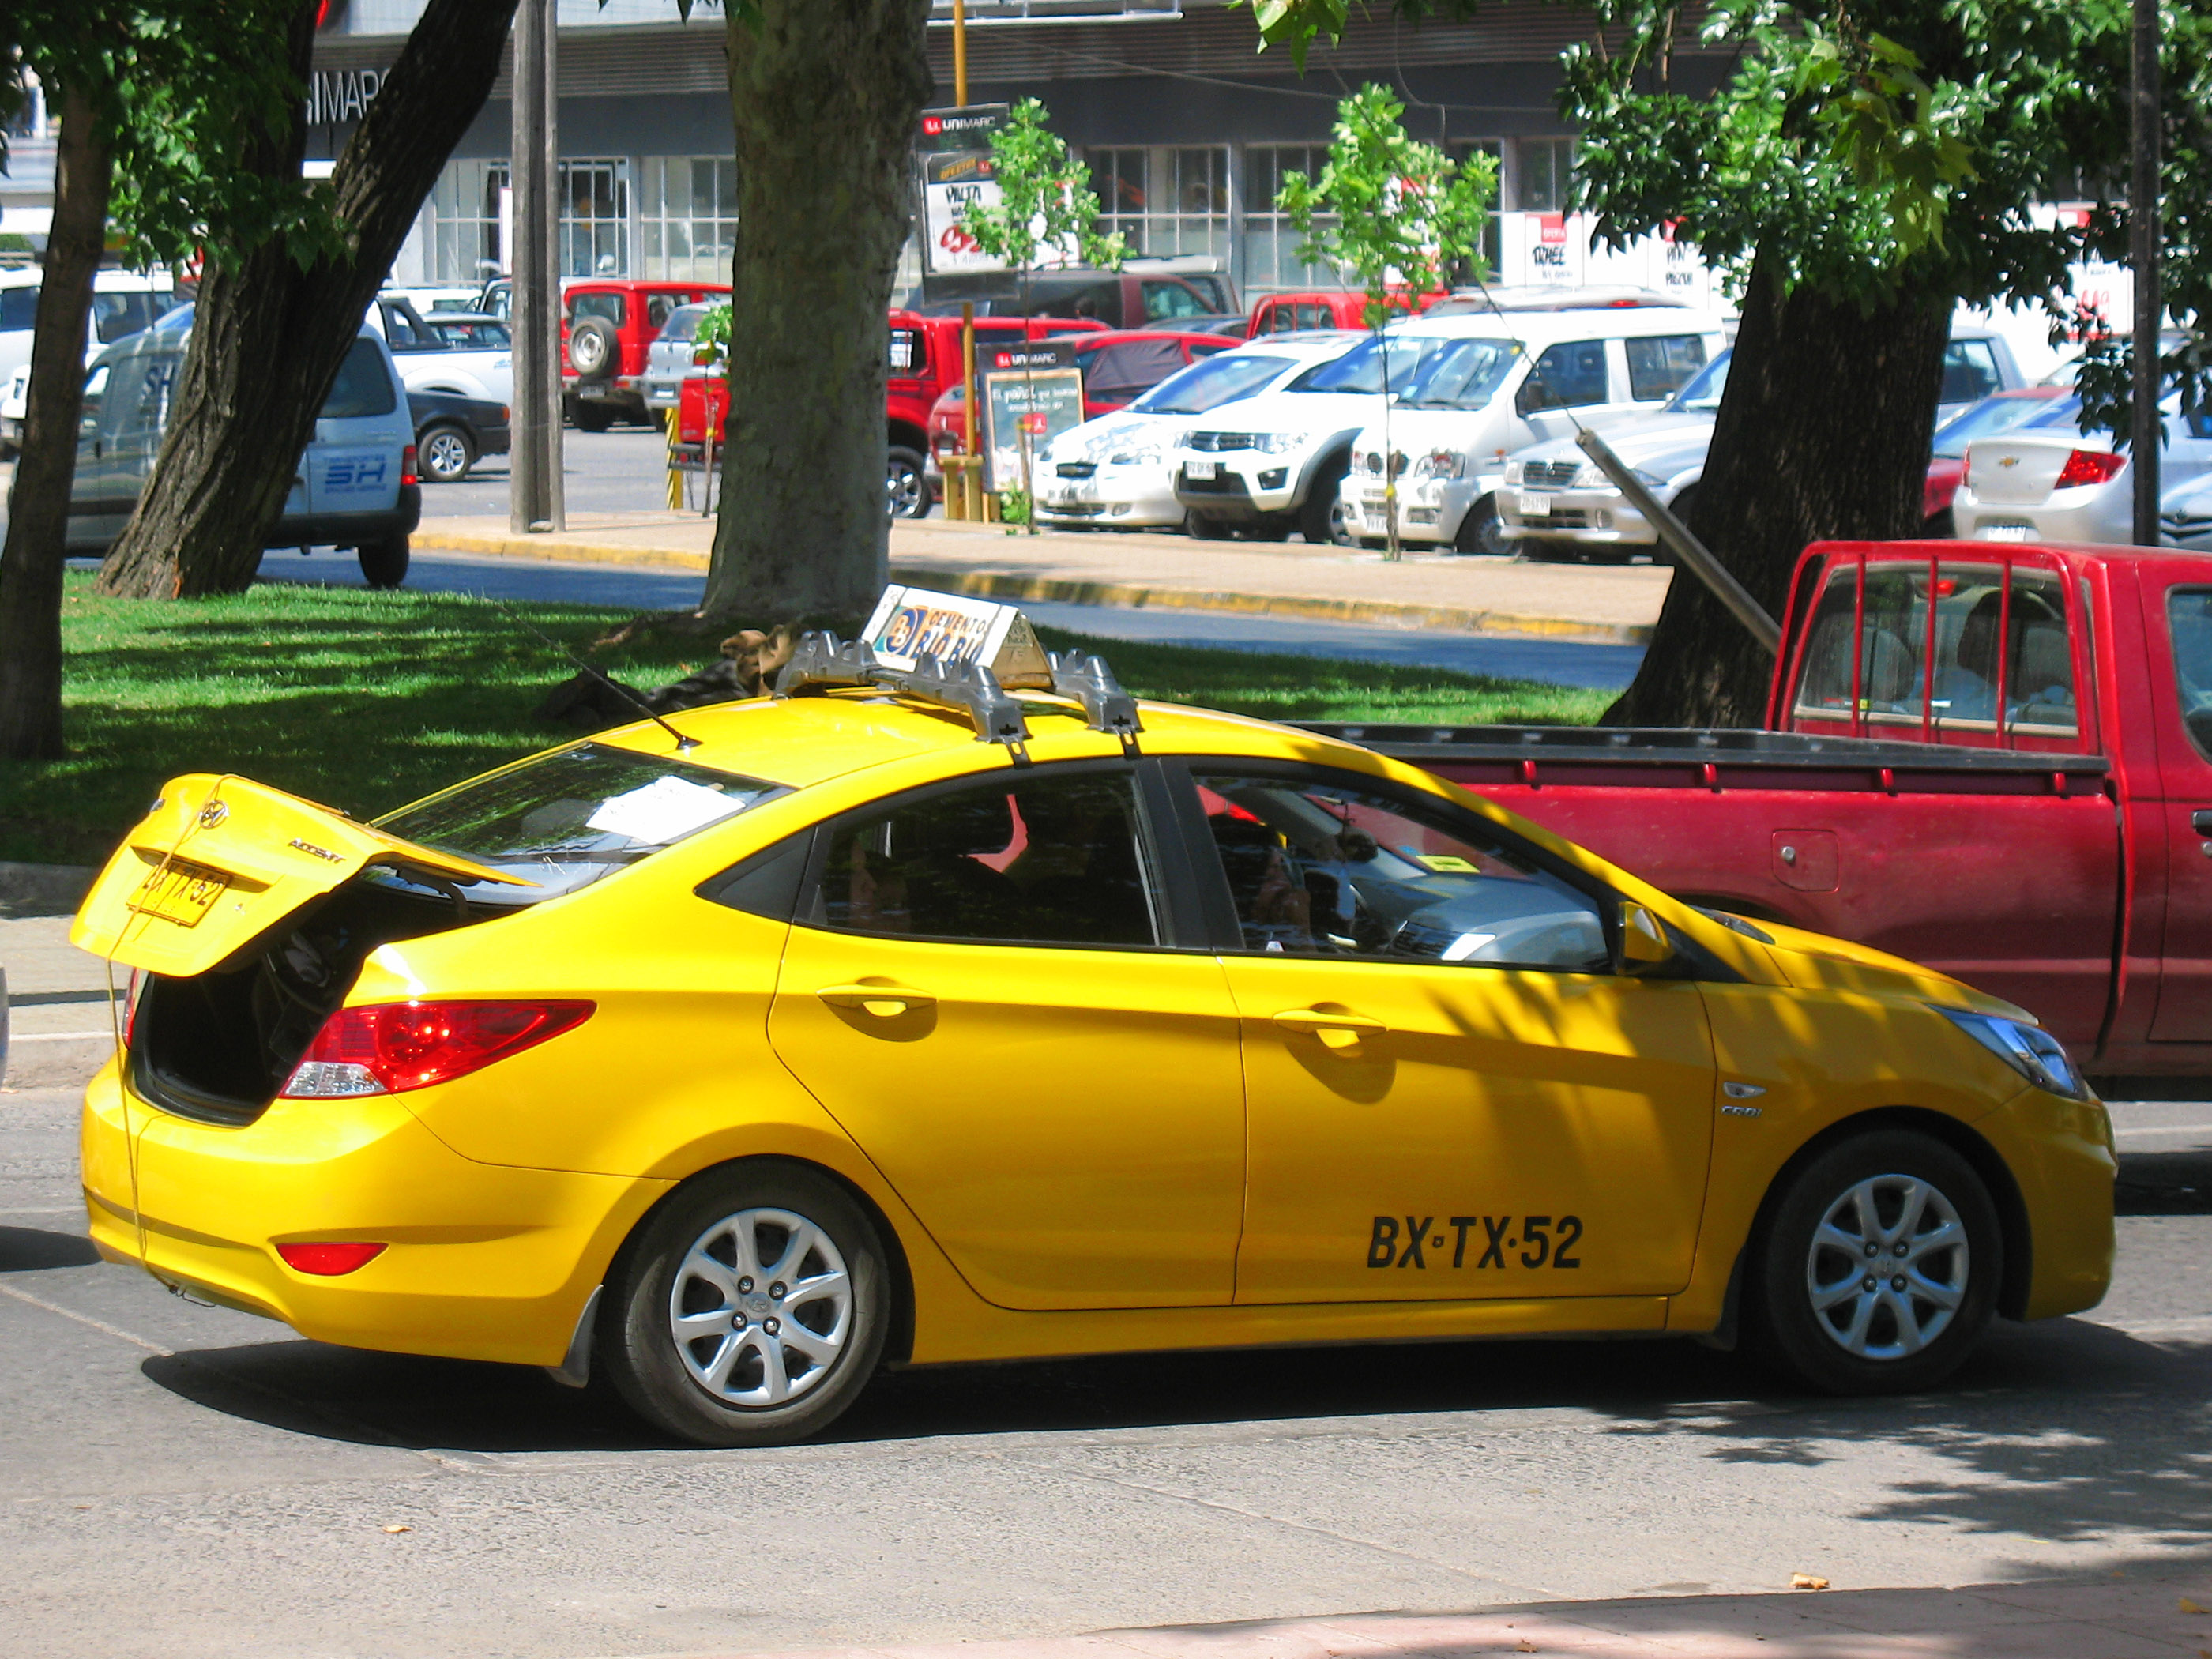 File Hyundai Accent Gl 1 5 Crdi 2010 11845535466 Jpg Wikimedia Commons